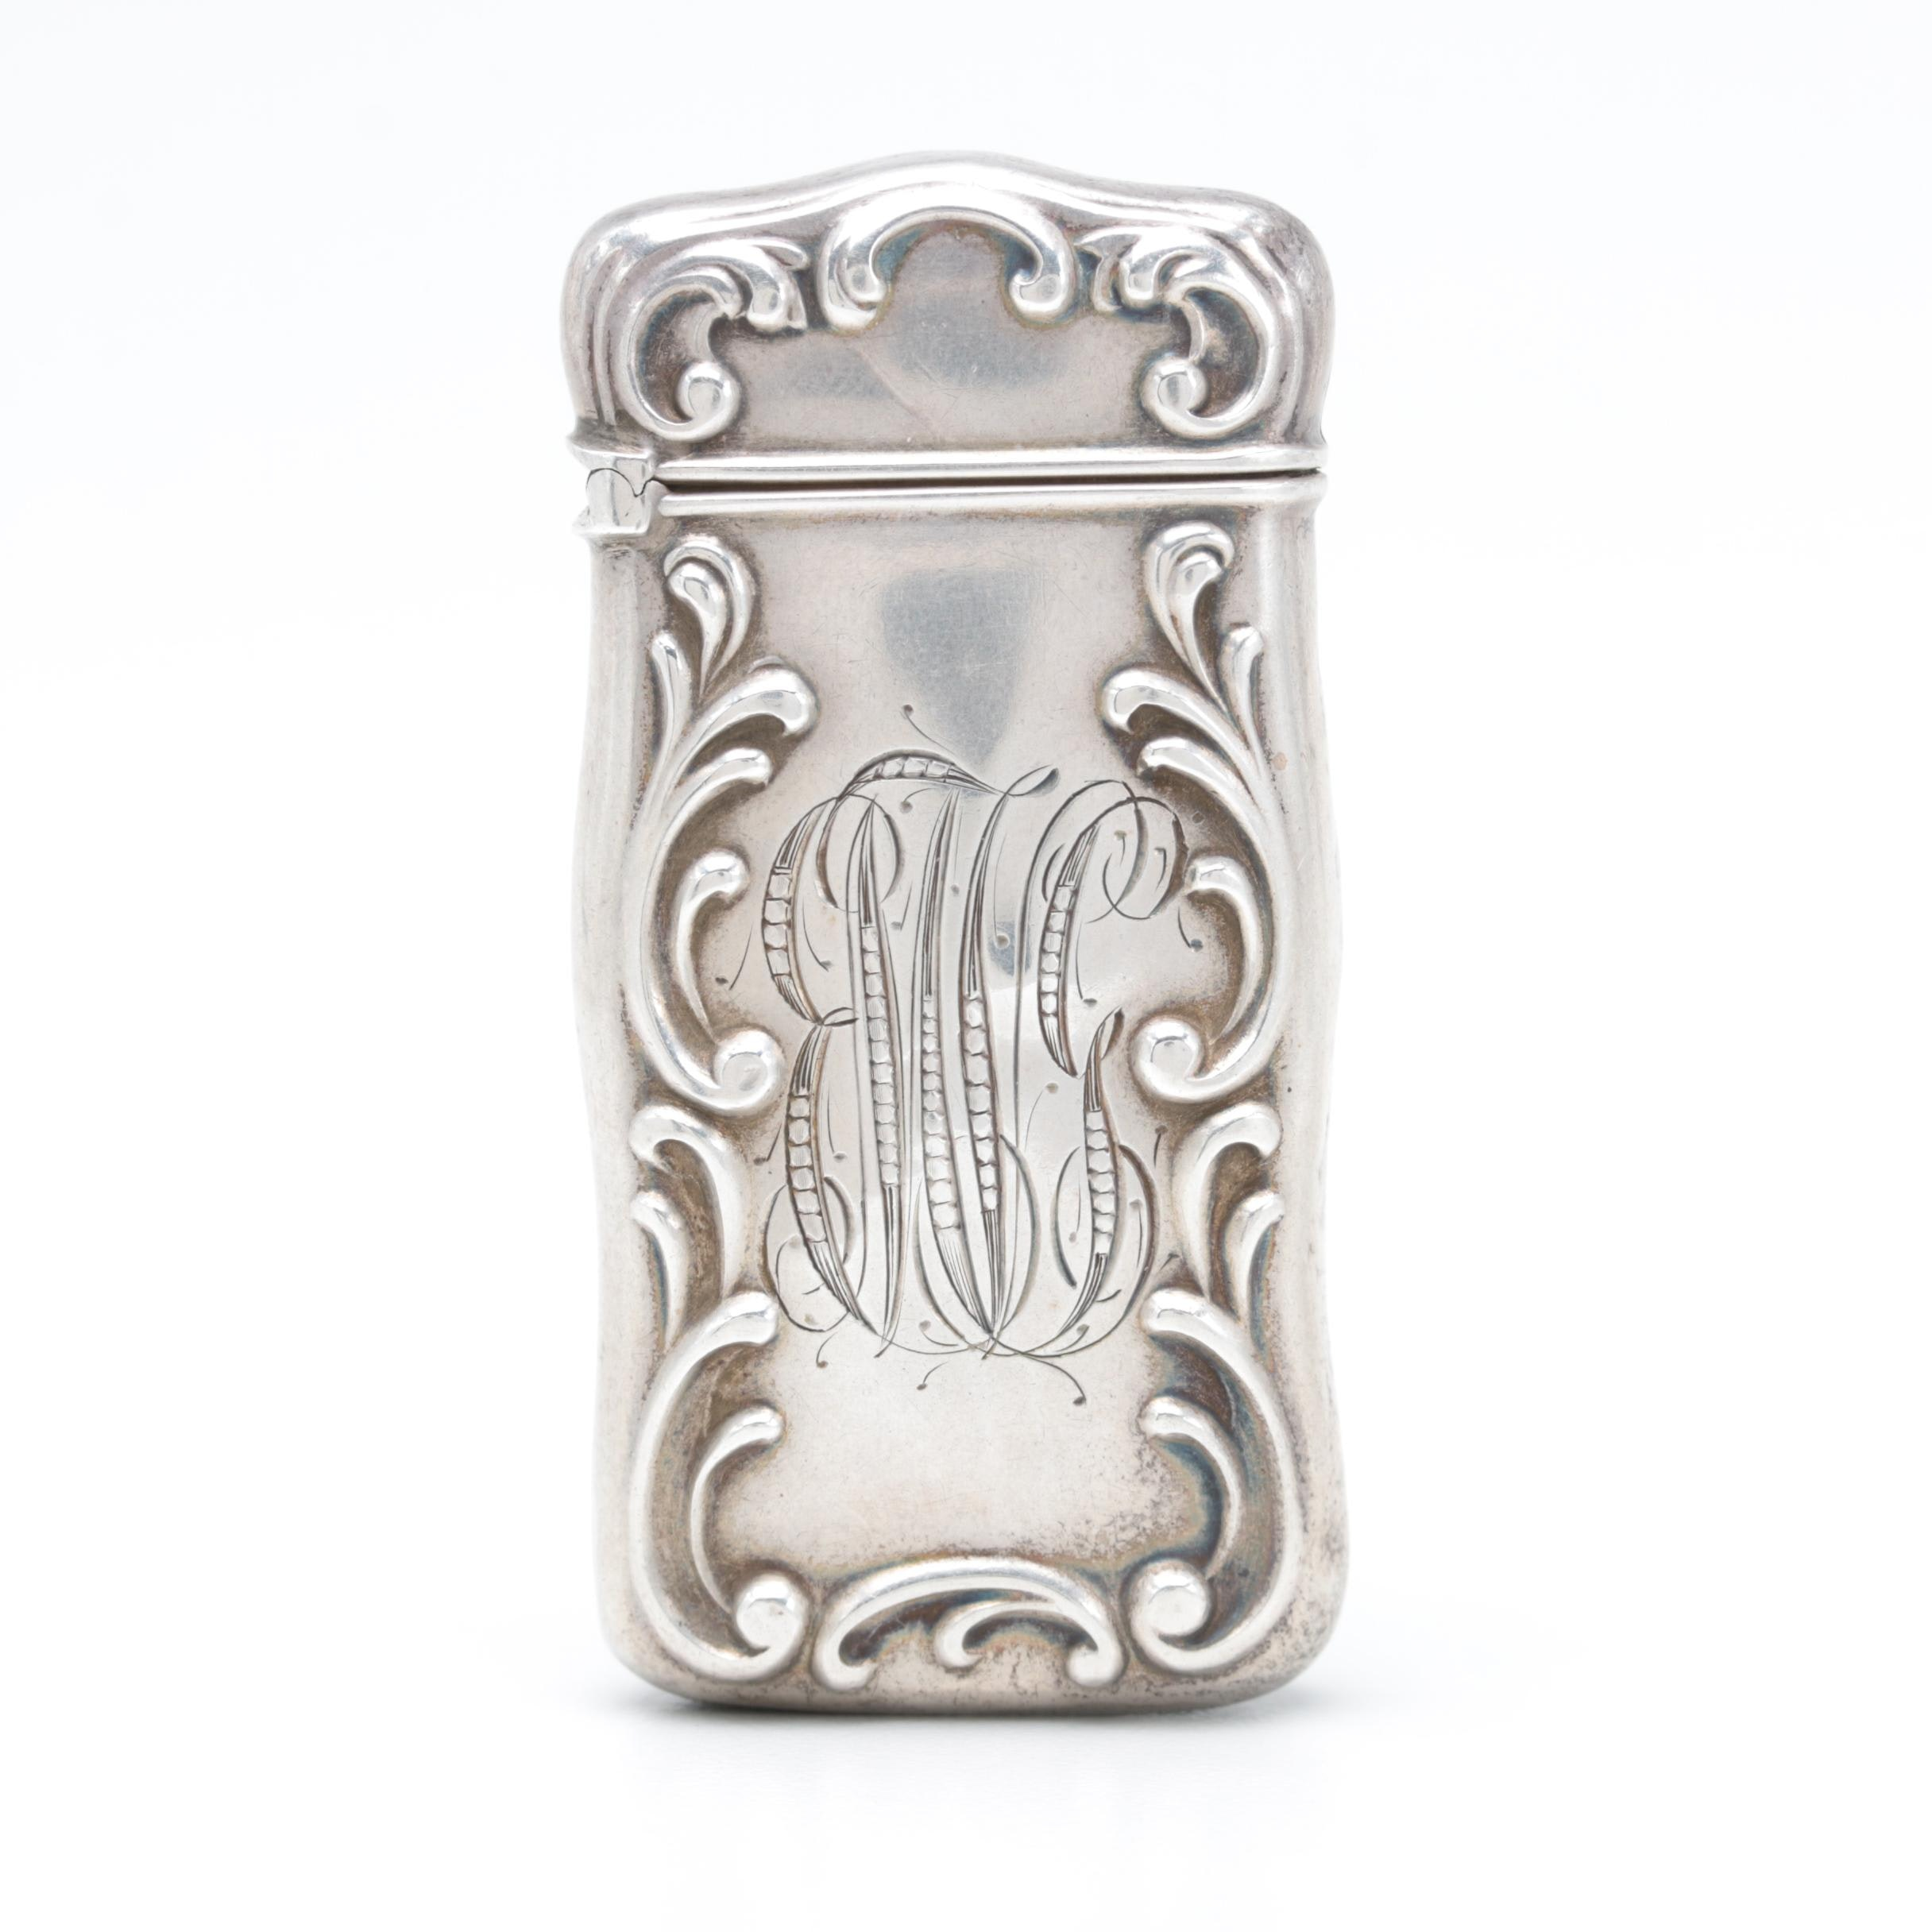 Antigue Gorham Sterling Silver Match Case